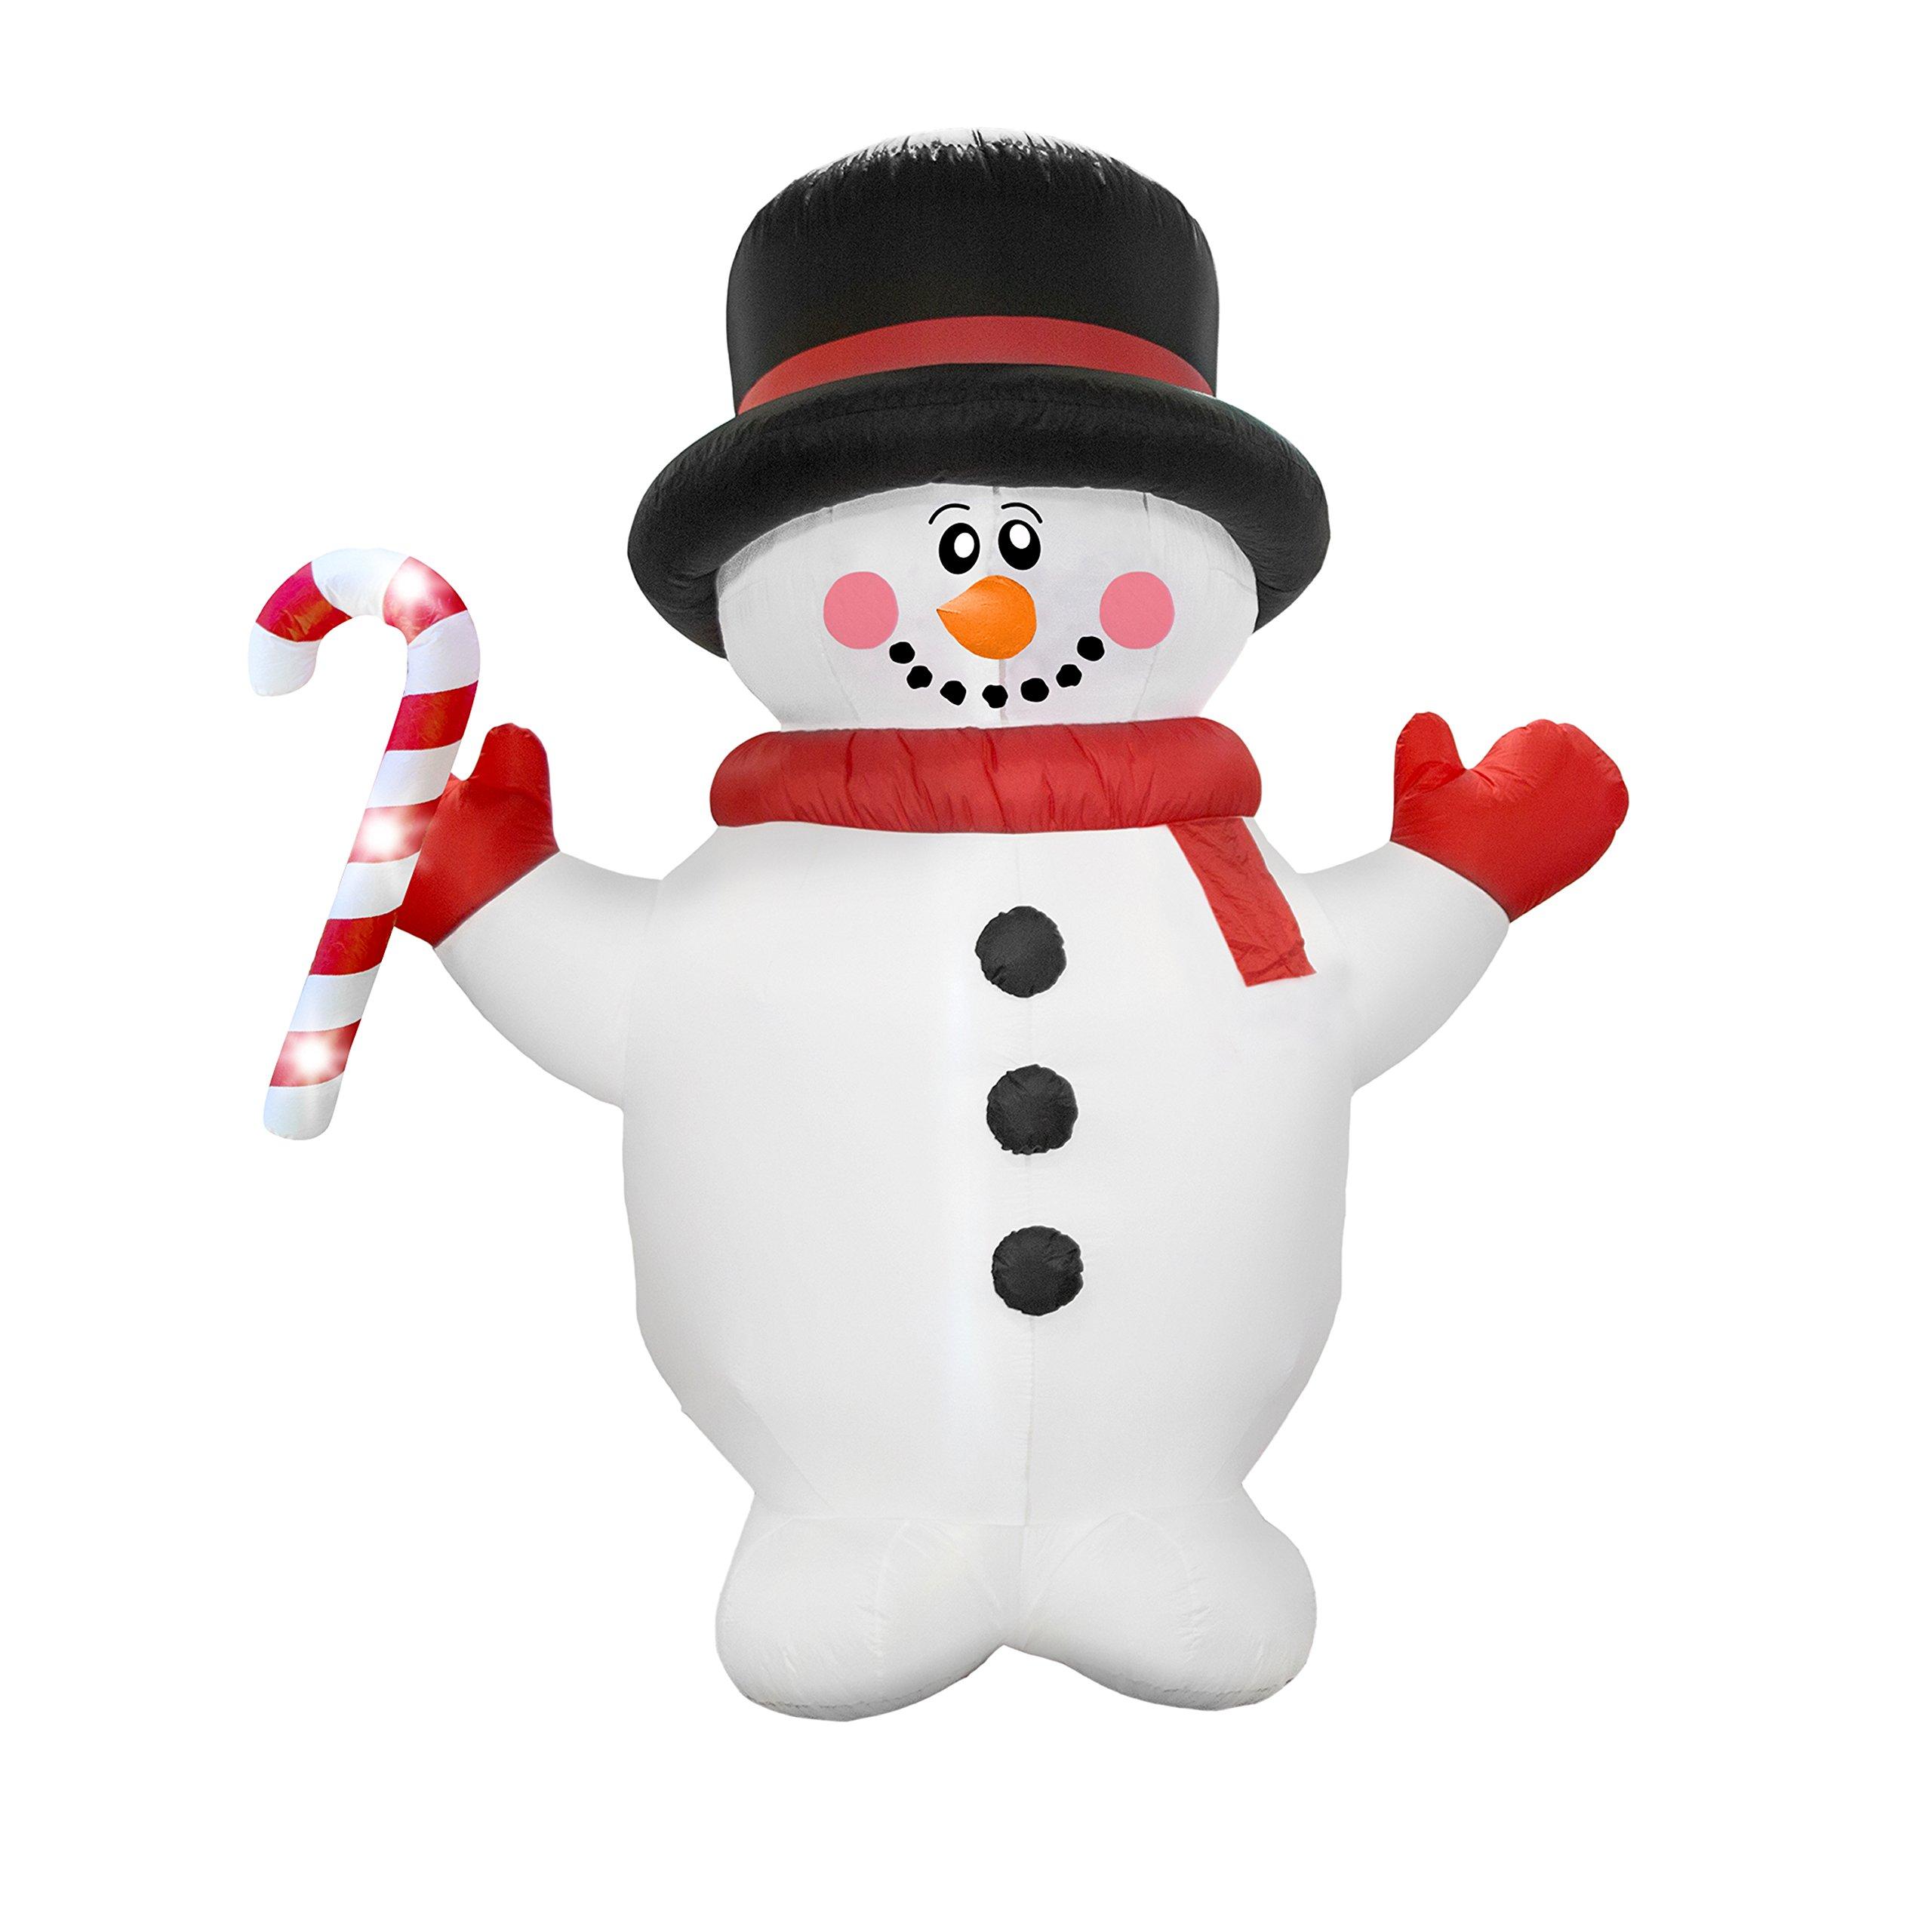 AirFormz AIR12510 Airblown Inflatable Holiday Yard Decoration, 7.5' Tall, Snowman